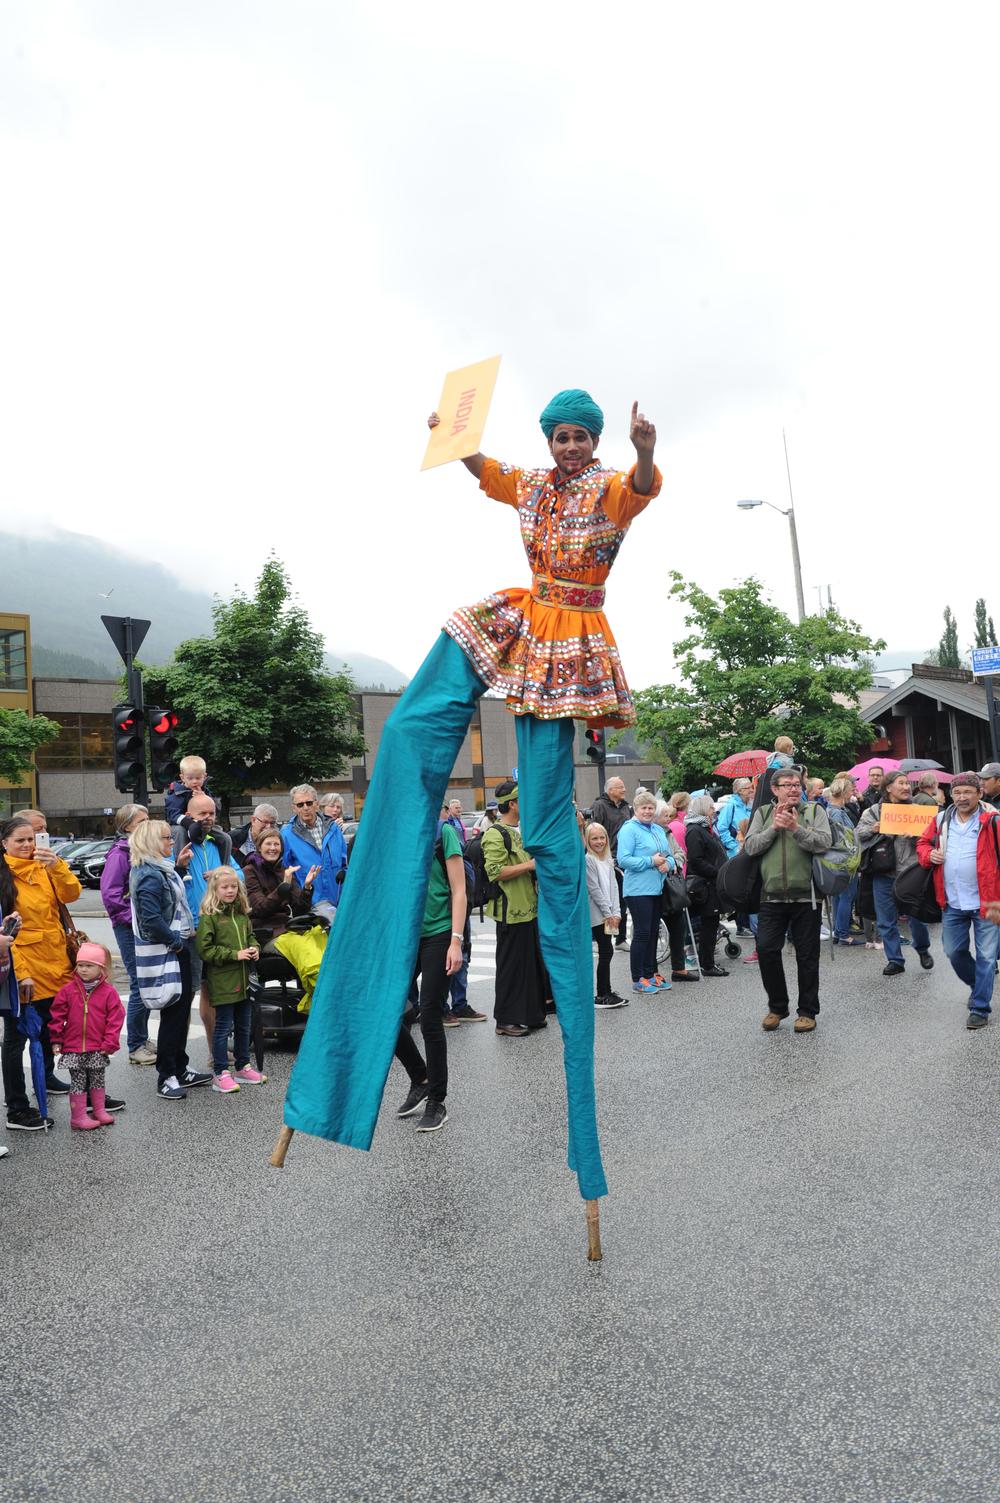 Geir Birkeland FestivalparadeDSC_2612.jpg